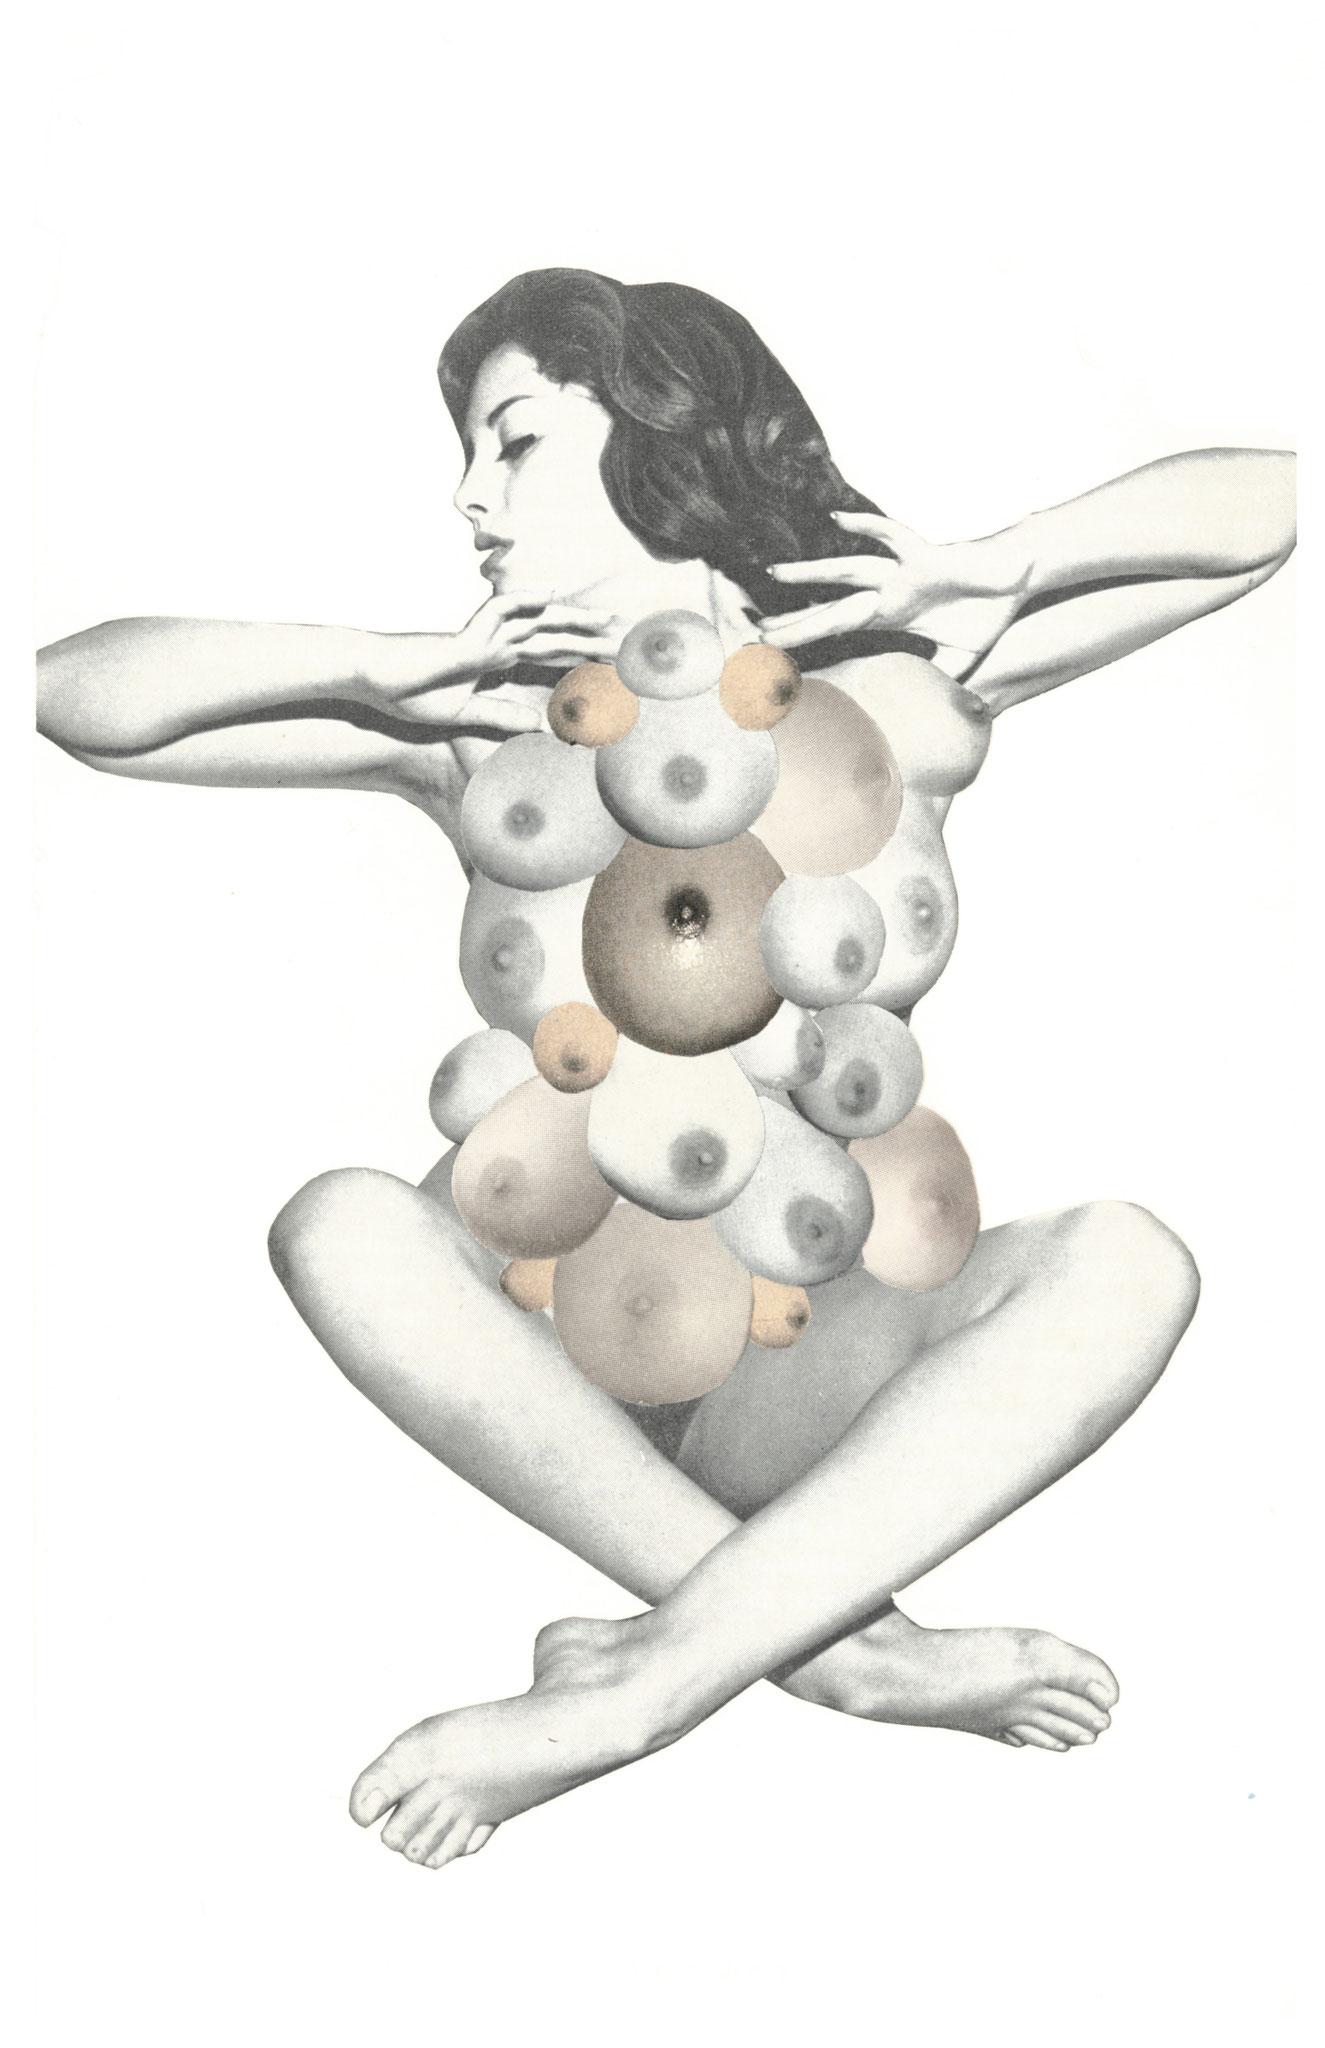 Prodigalité, 13x21cm, 2017